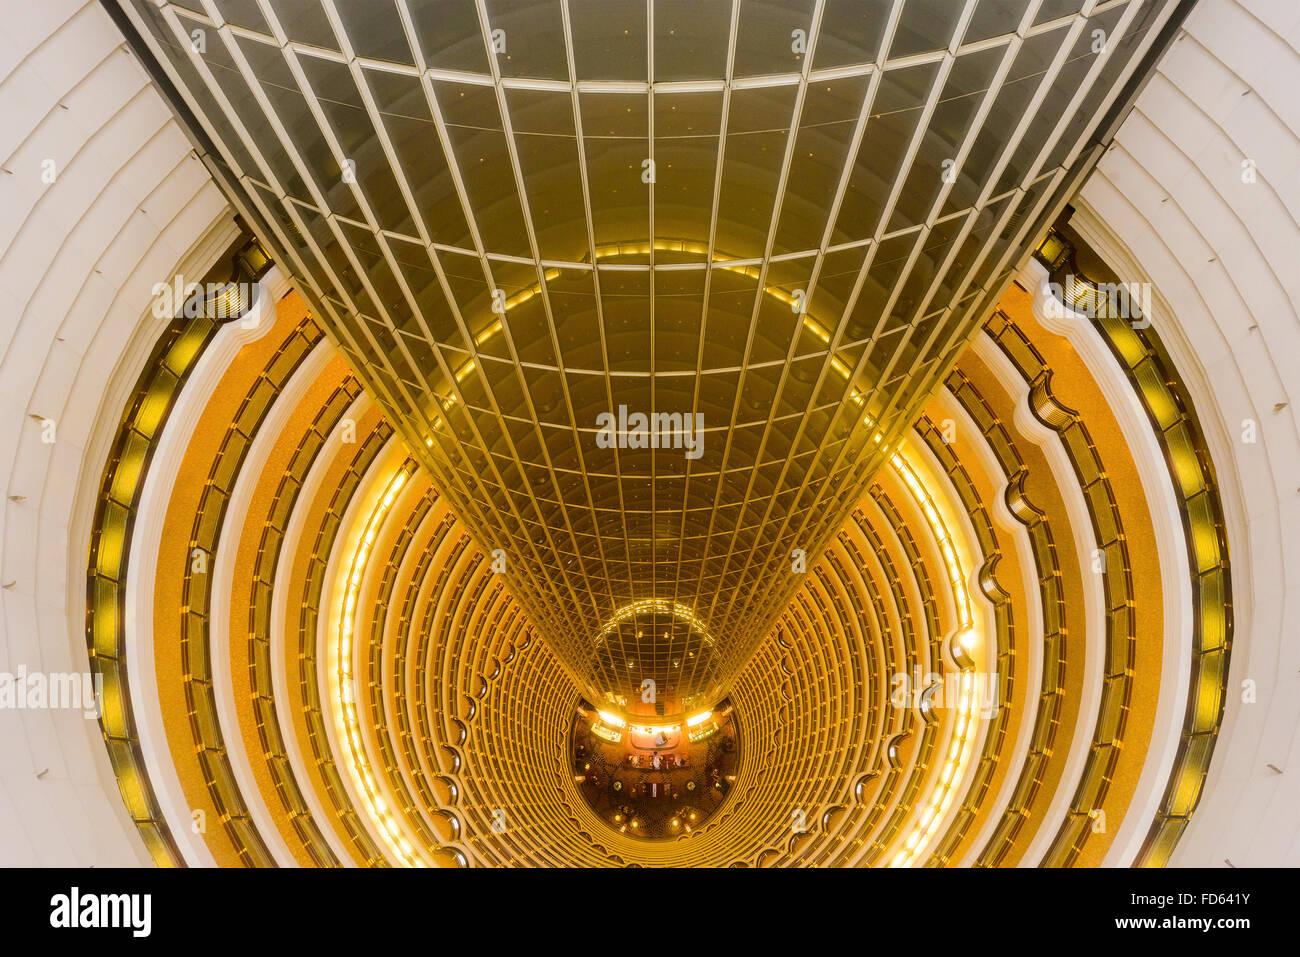 The Grand Hyatt Shanghai viewed from atop the atrium in Shanghai, China. - Stock Image